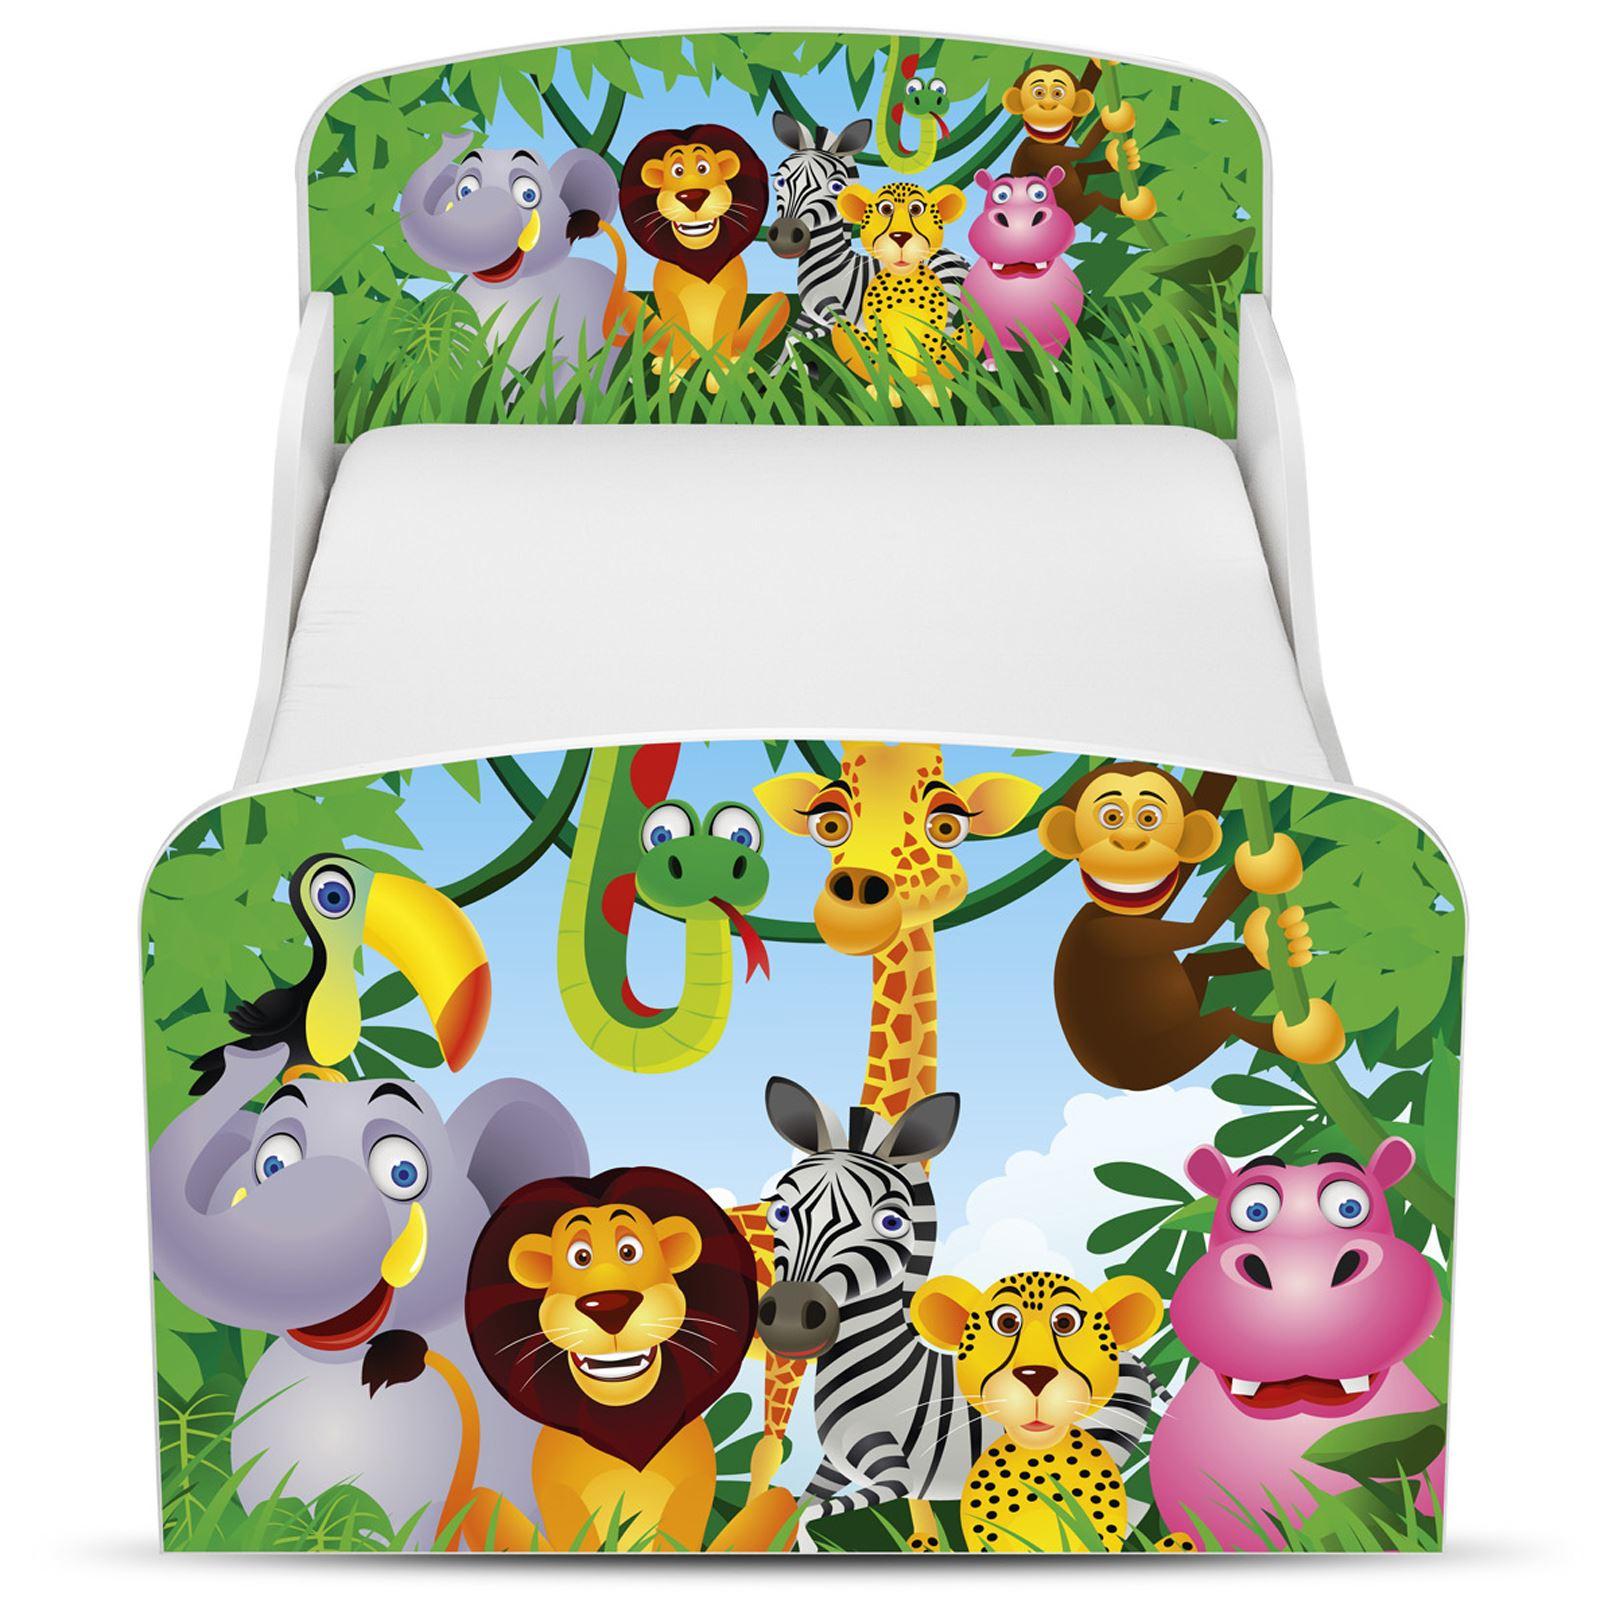 Toddler Bed Mdf Kids Boys Girls Junior Bedroom Mattress